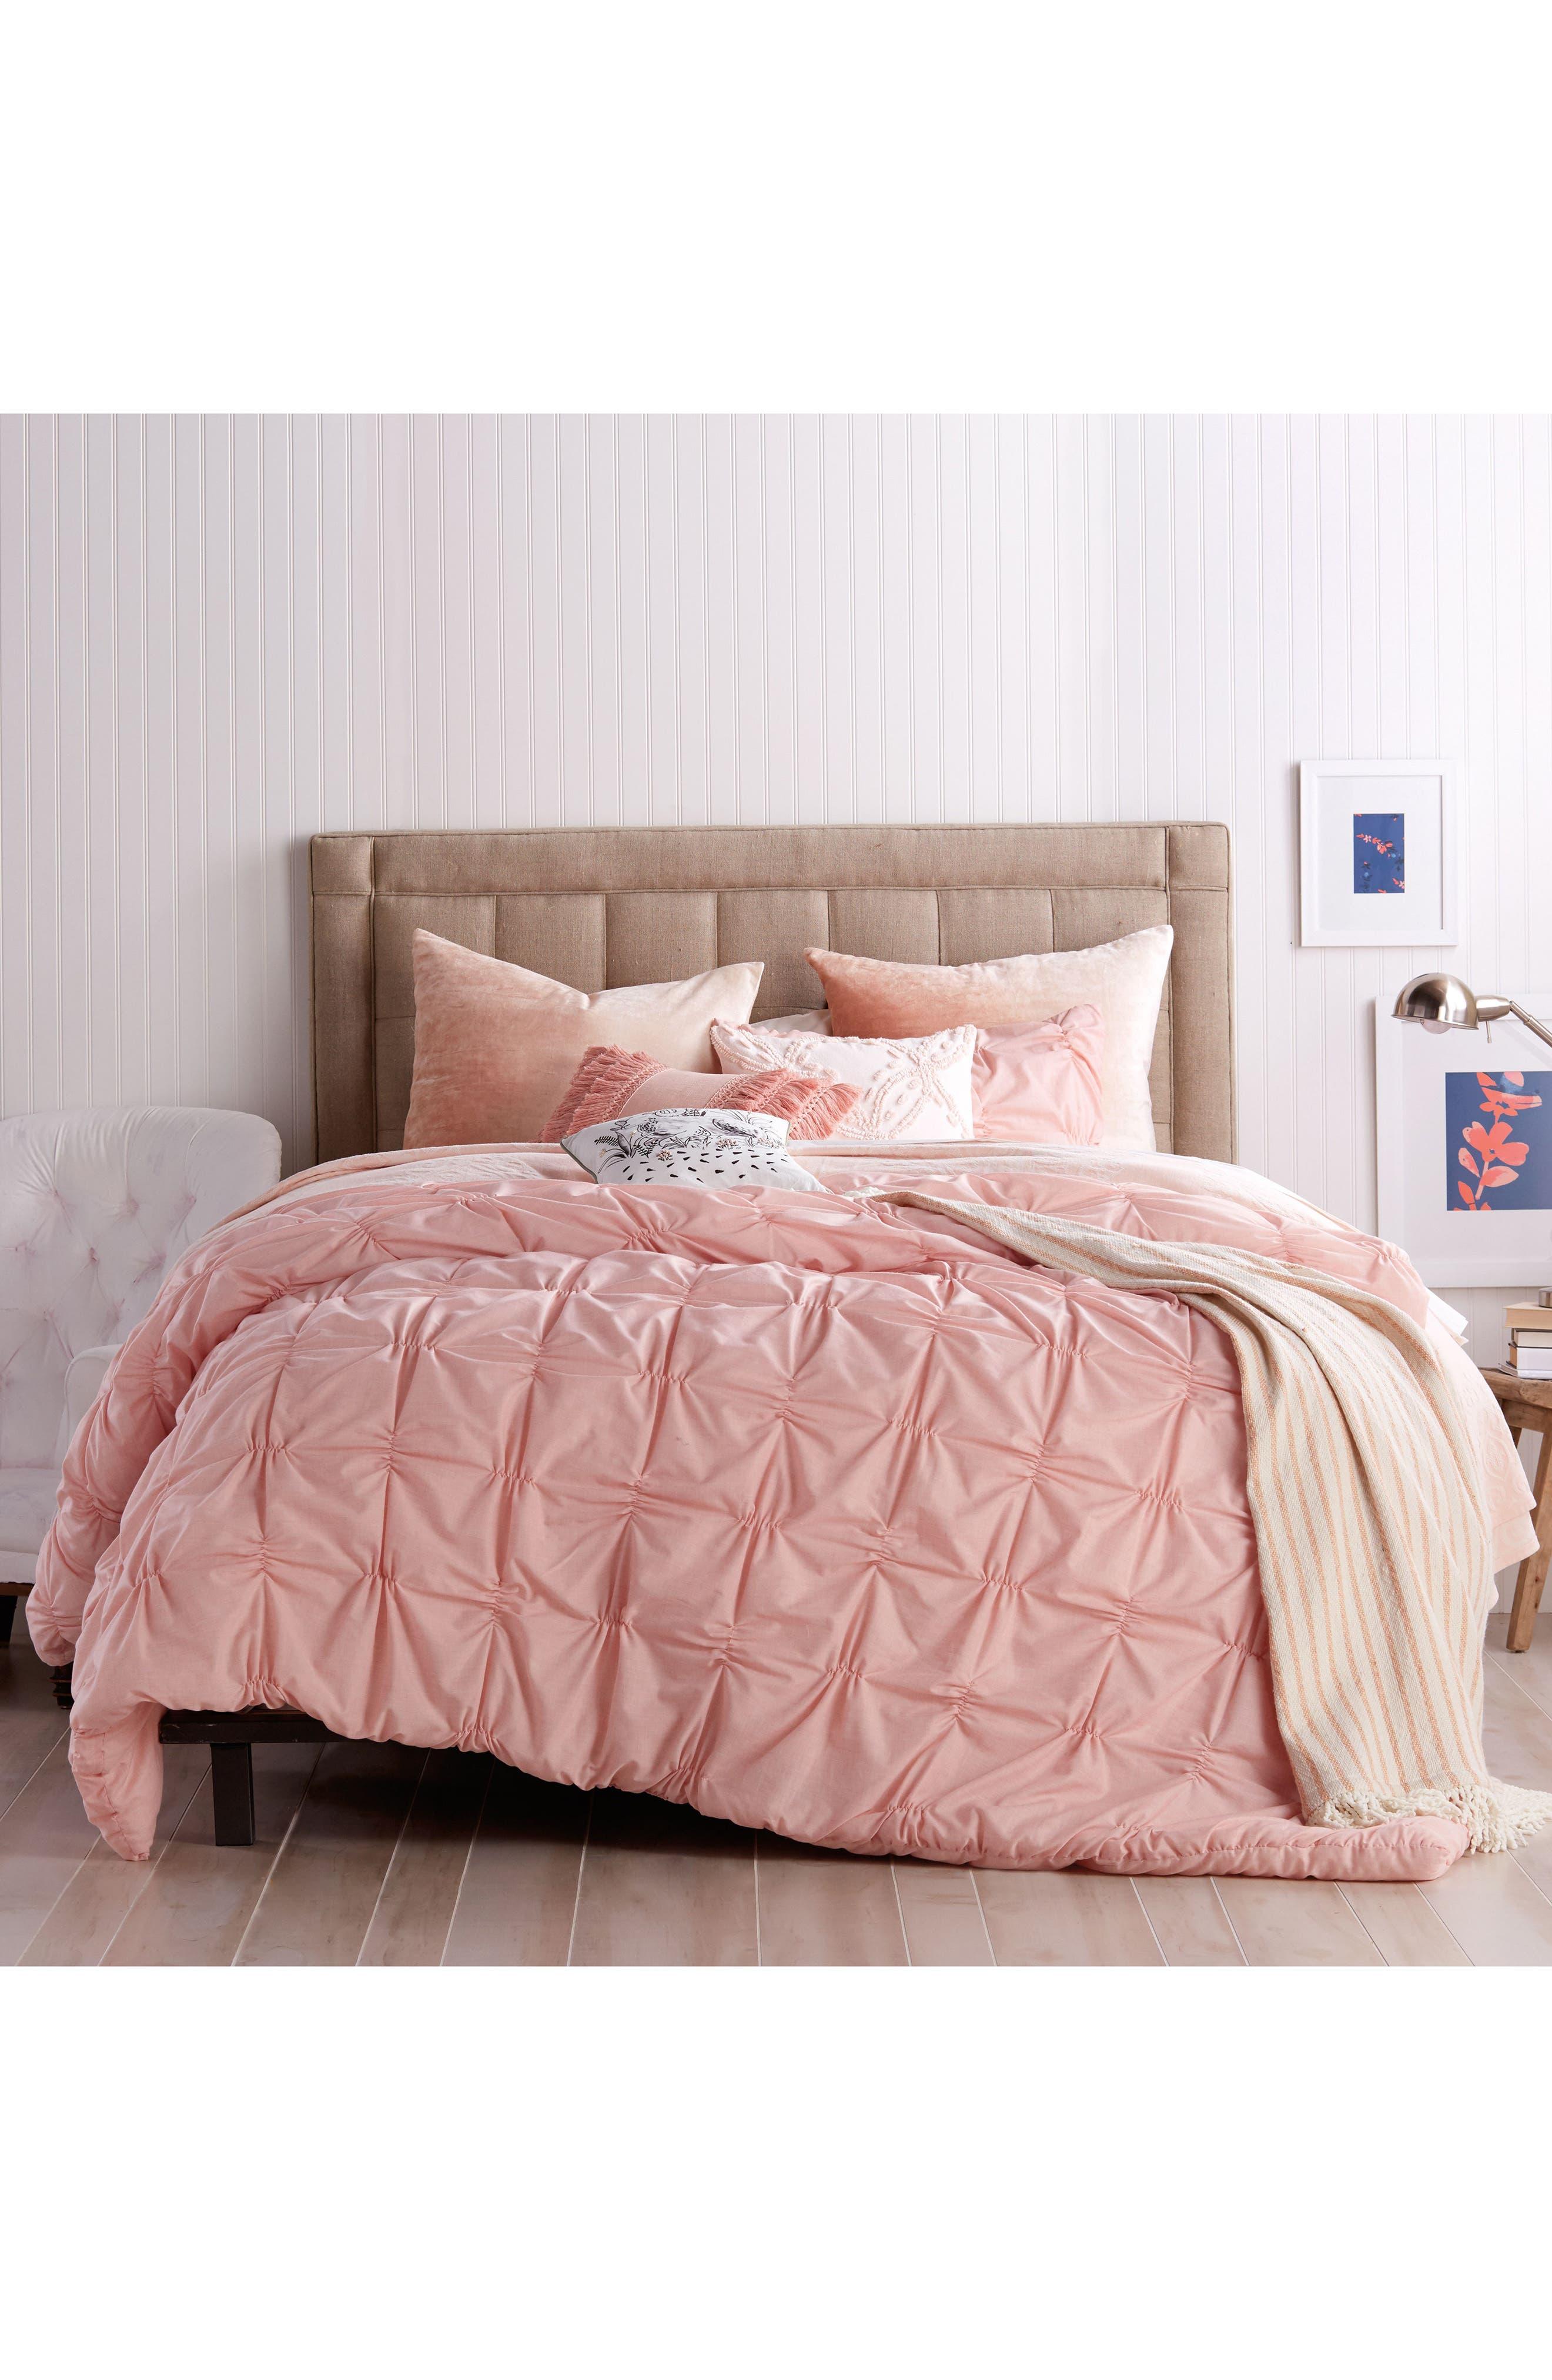 Check Smocked Comforter & Sham Set,                             Main thumbnail 1, color,                             Blush